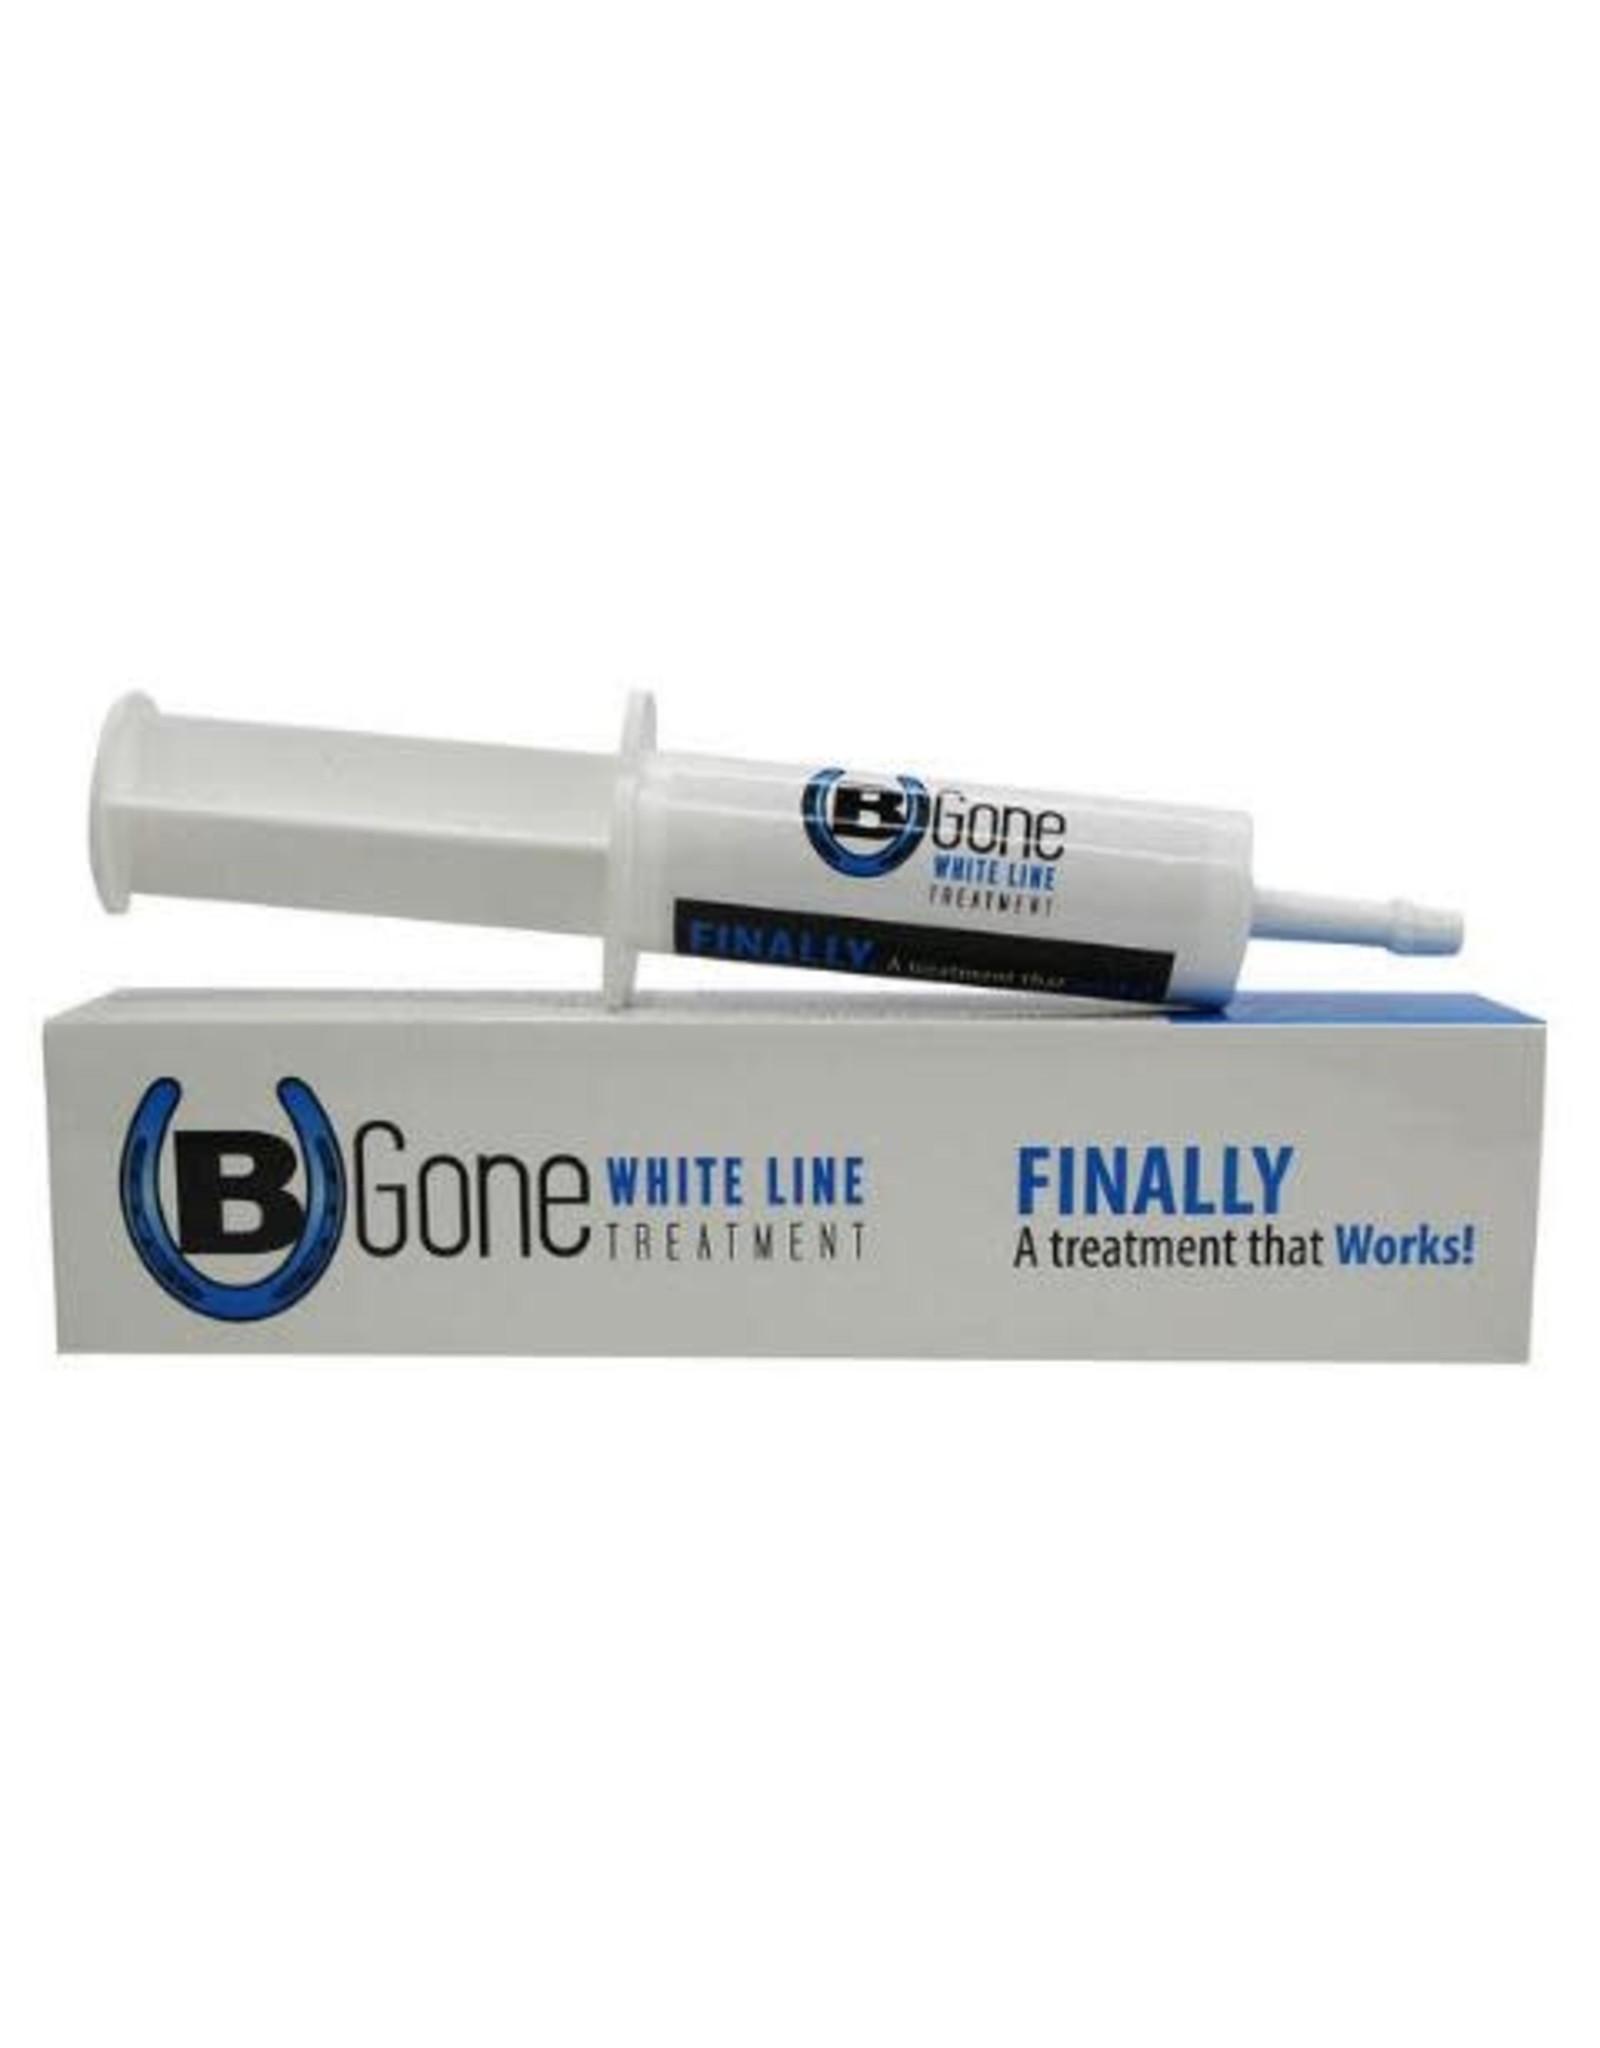 B Gone White Line Treatment 60cc